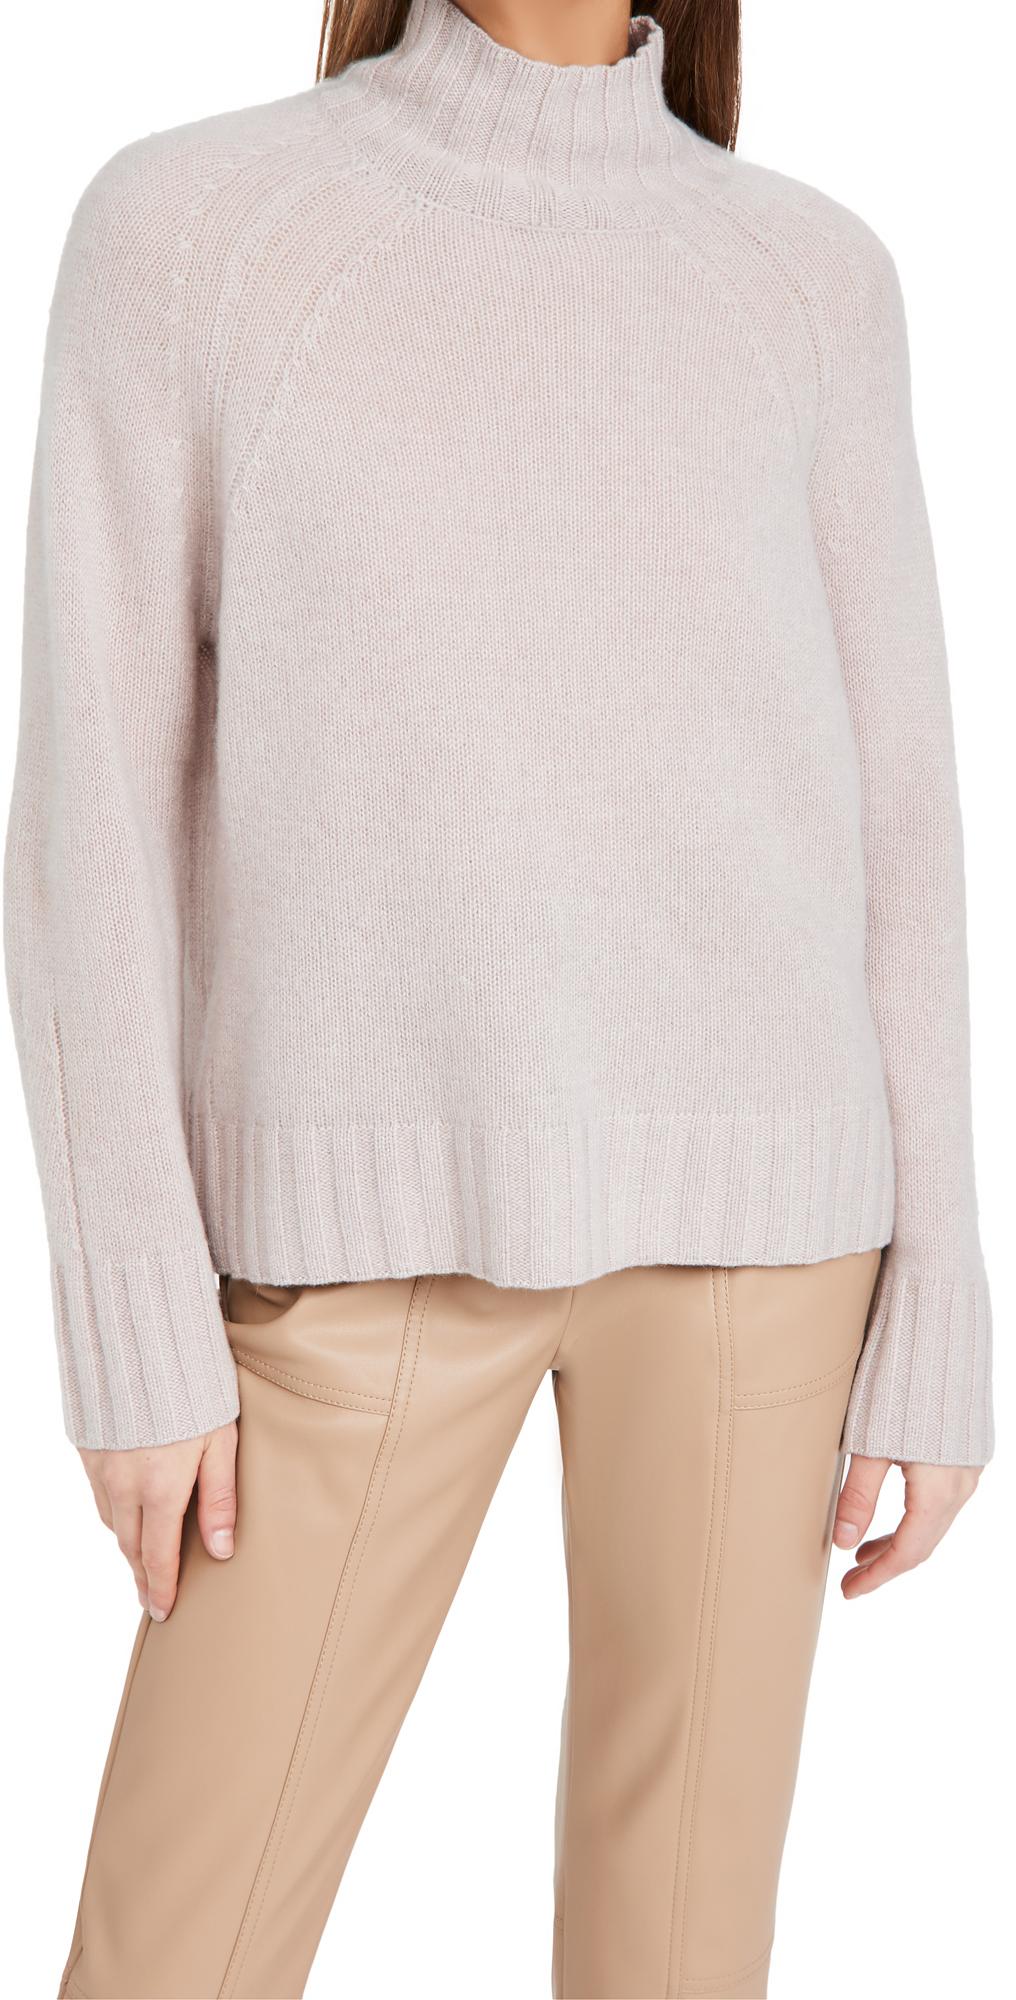 360 SWEATER Leighton Cashmere Sweater